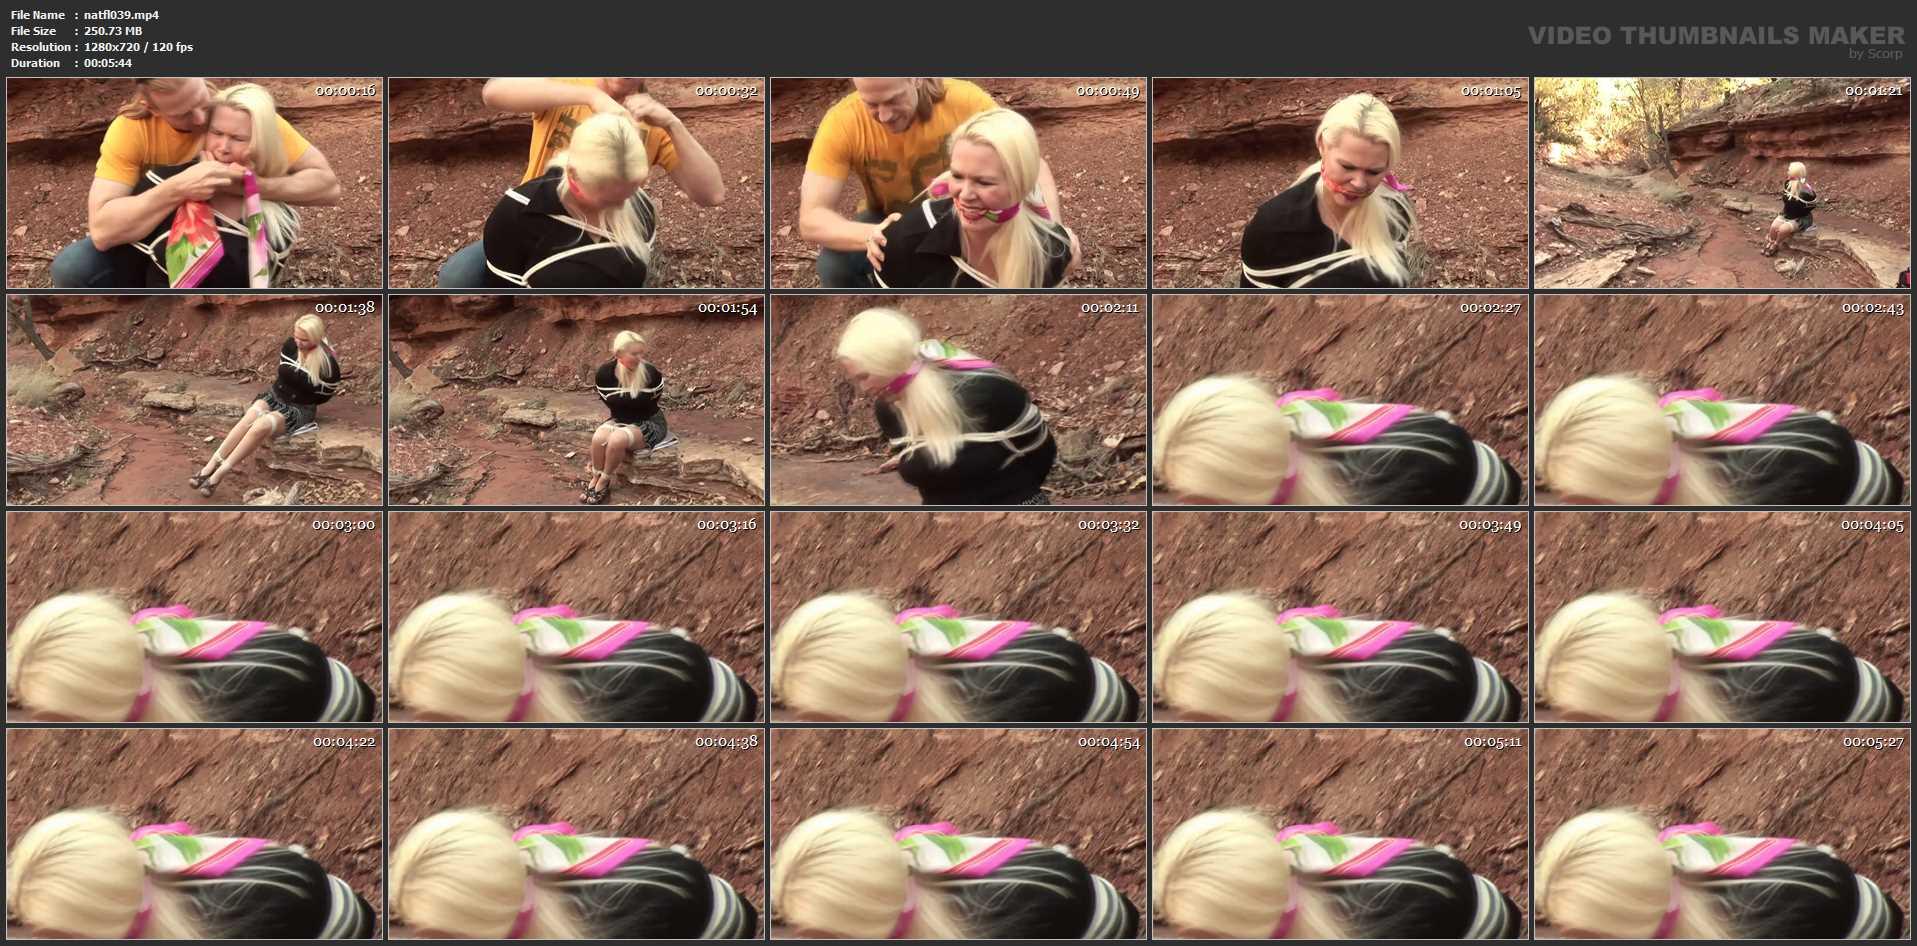 [DAMSEL STYLE BONDAGE & BONDAGE SEX VIDEOS] Secretary Kordelia K*idnapped & Double Gagged in the Woods. Featuring: Kordelia Devonshire [HD][720p][MP4]